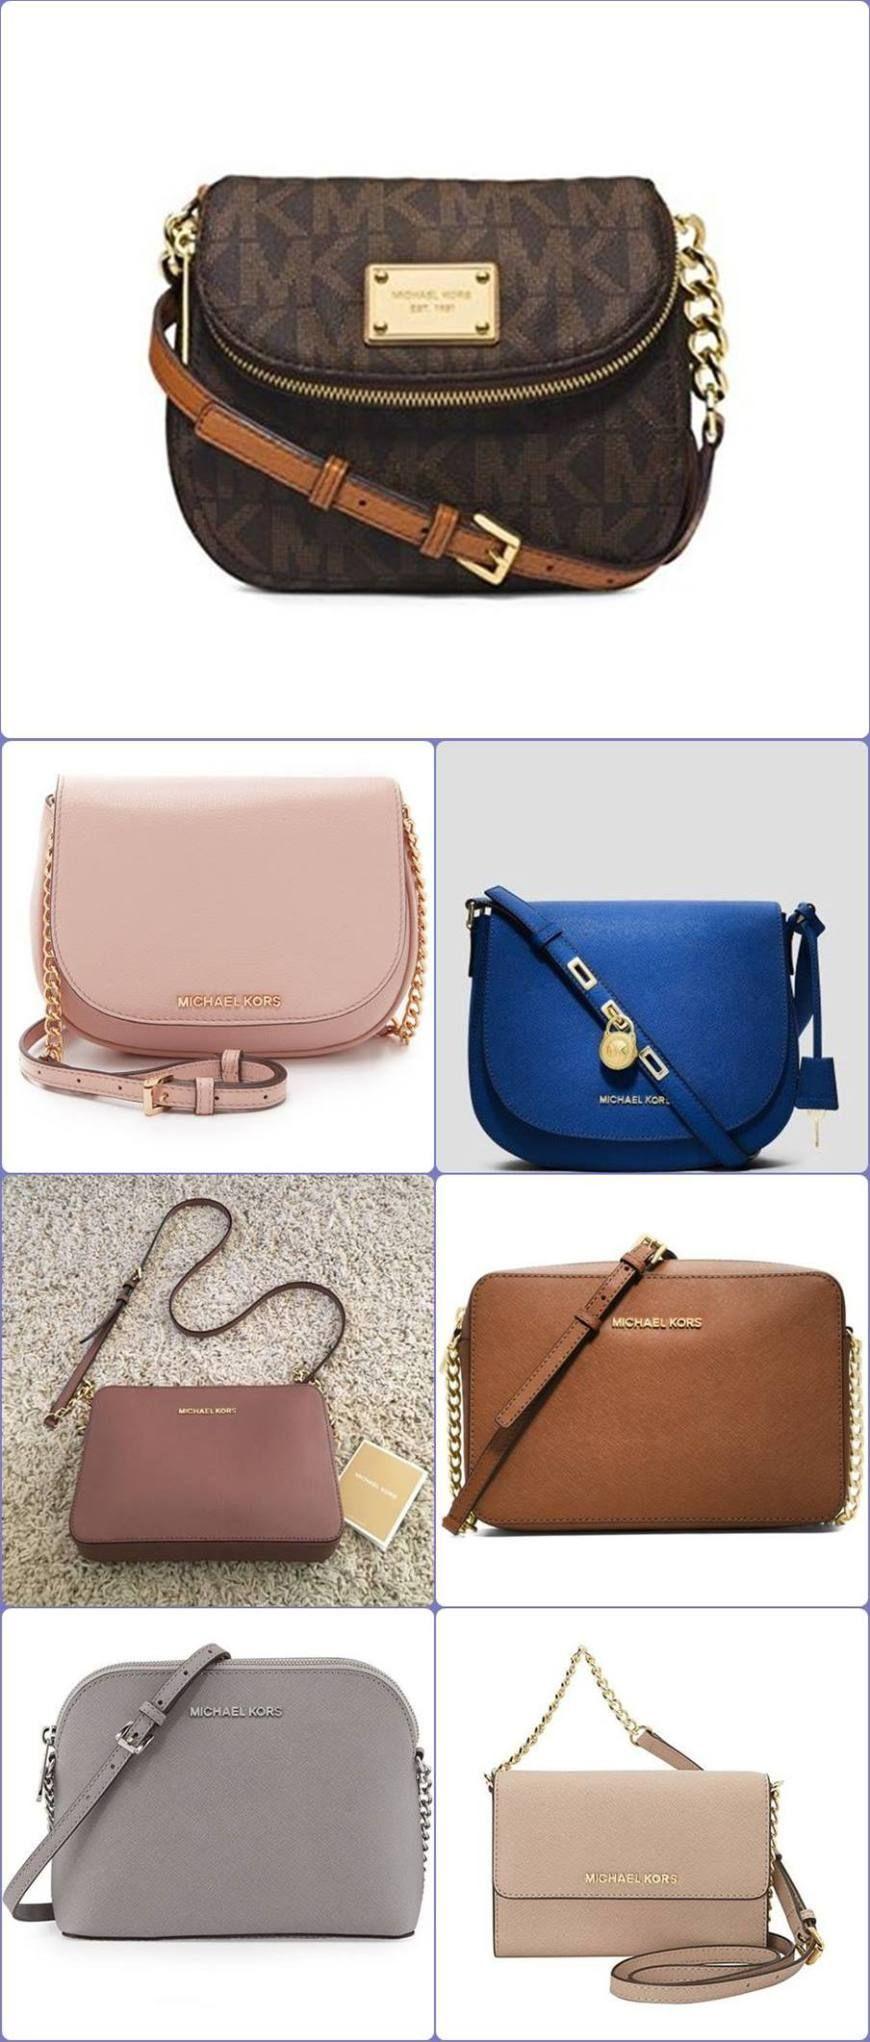 ad941bb26 Michael Kors bolsa pequena tiracolo , mini bag, handbag #michaelkors  #bagsmichaelkors #michaelkorsbags #bolsomichaelkors